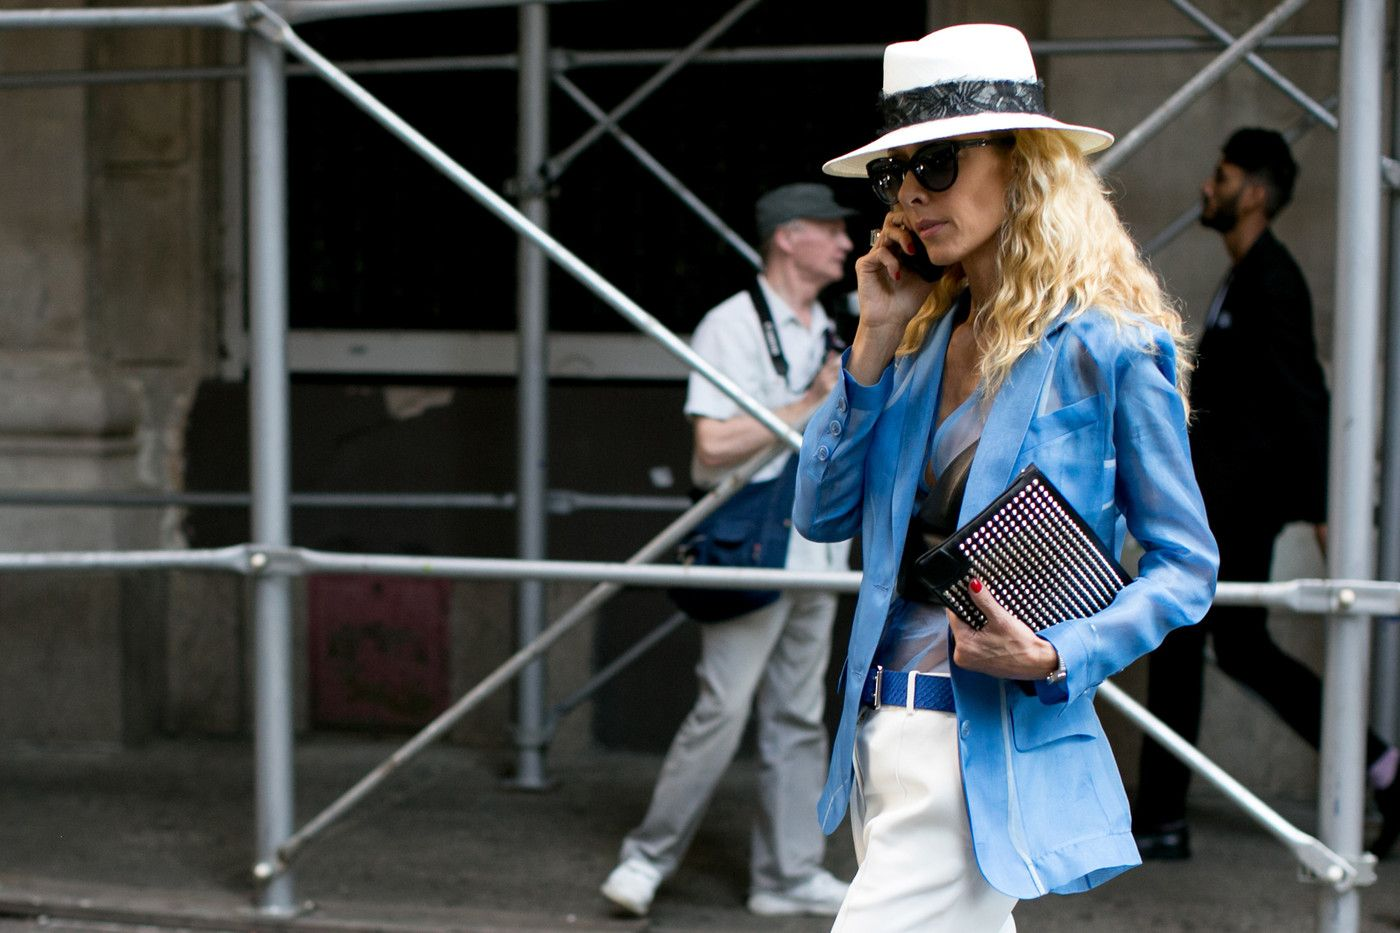 #StreetStyle Spotlight: Chic Hats. Bad hair day, be gone!  | structured fedora + crisp blazer